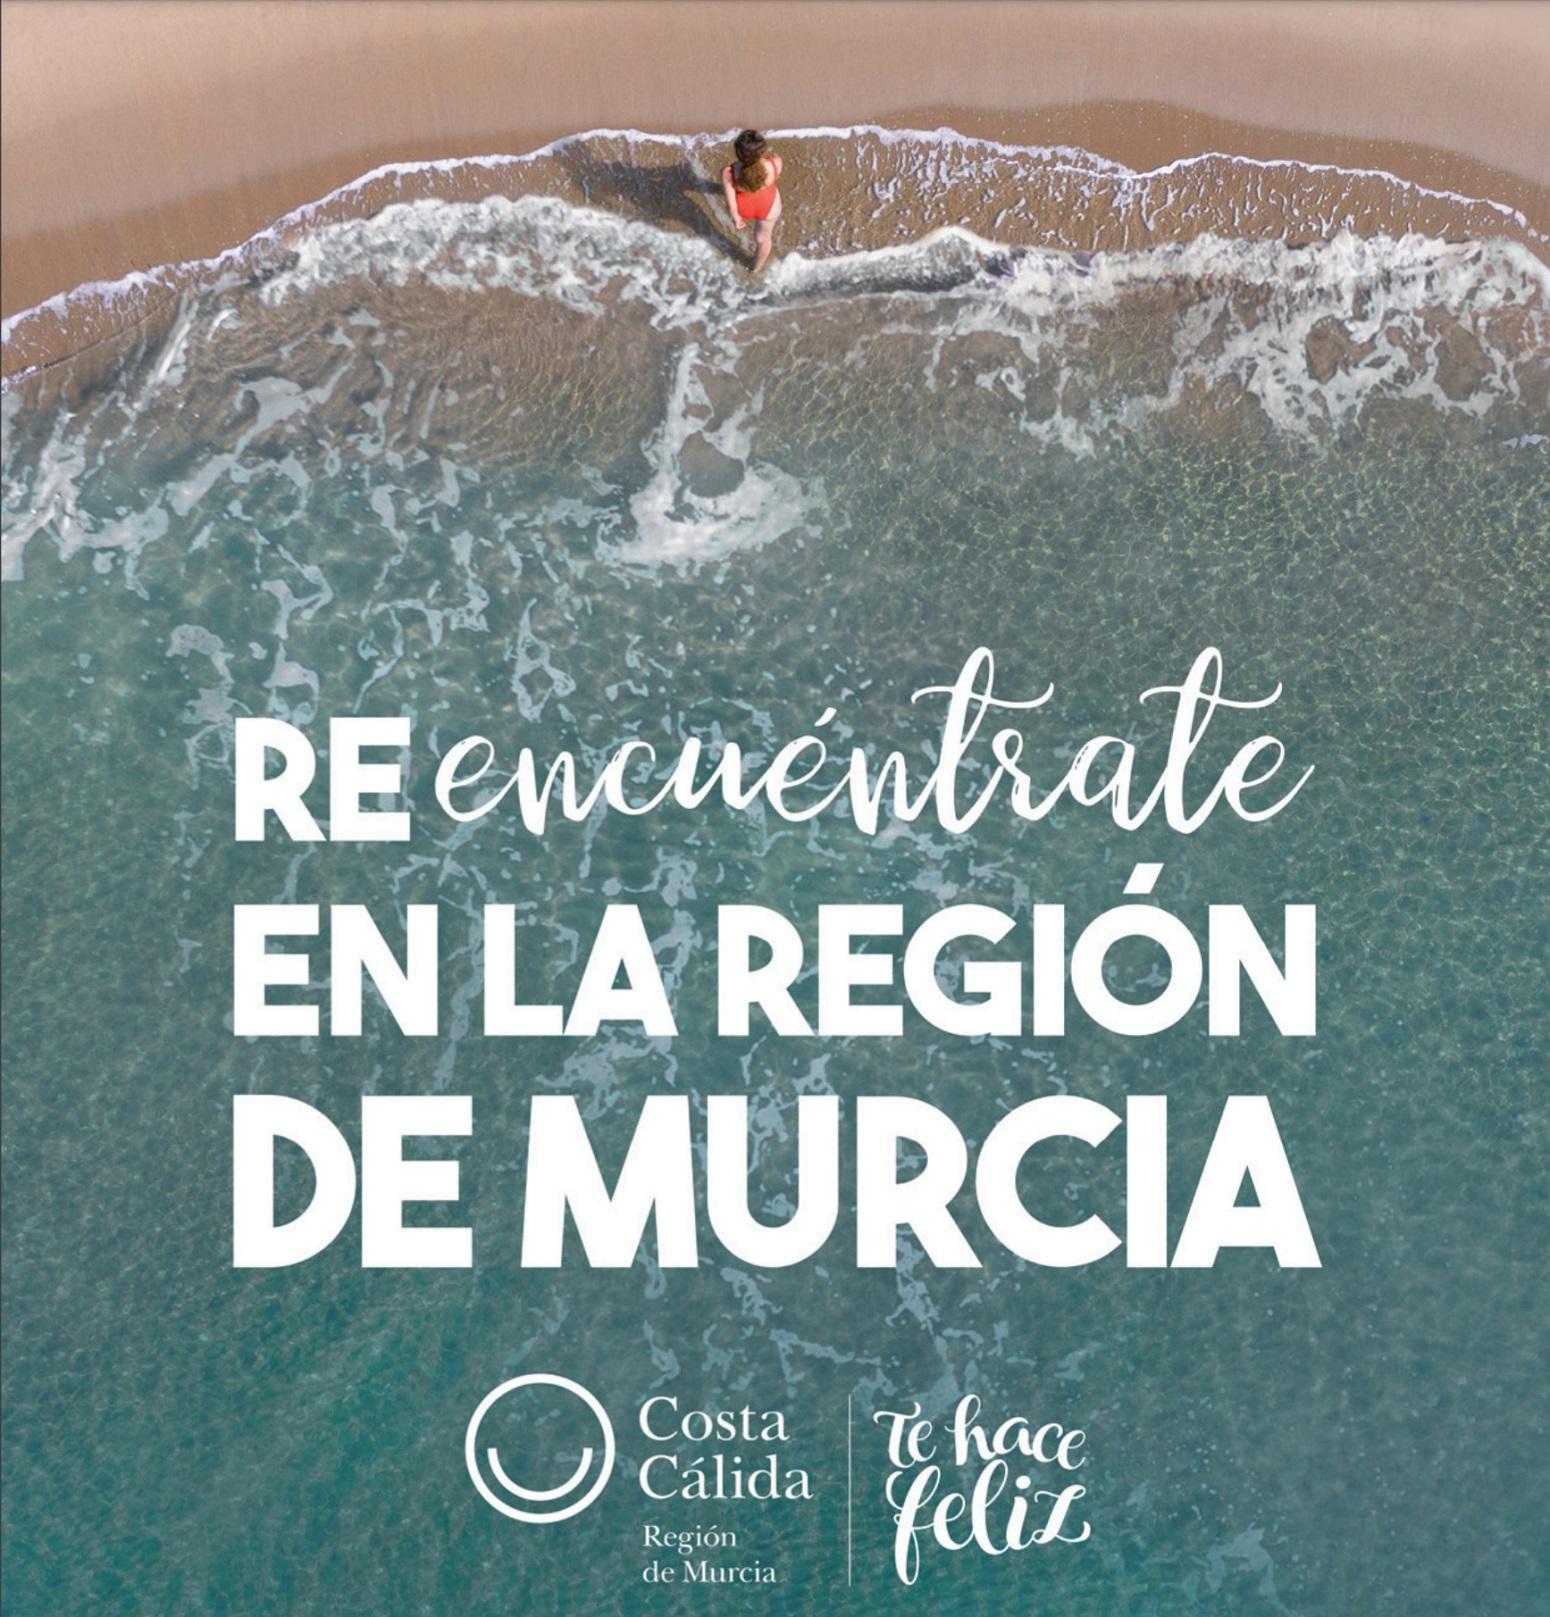 reencuentrate #volveraviajar